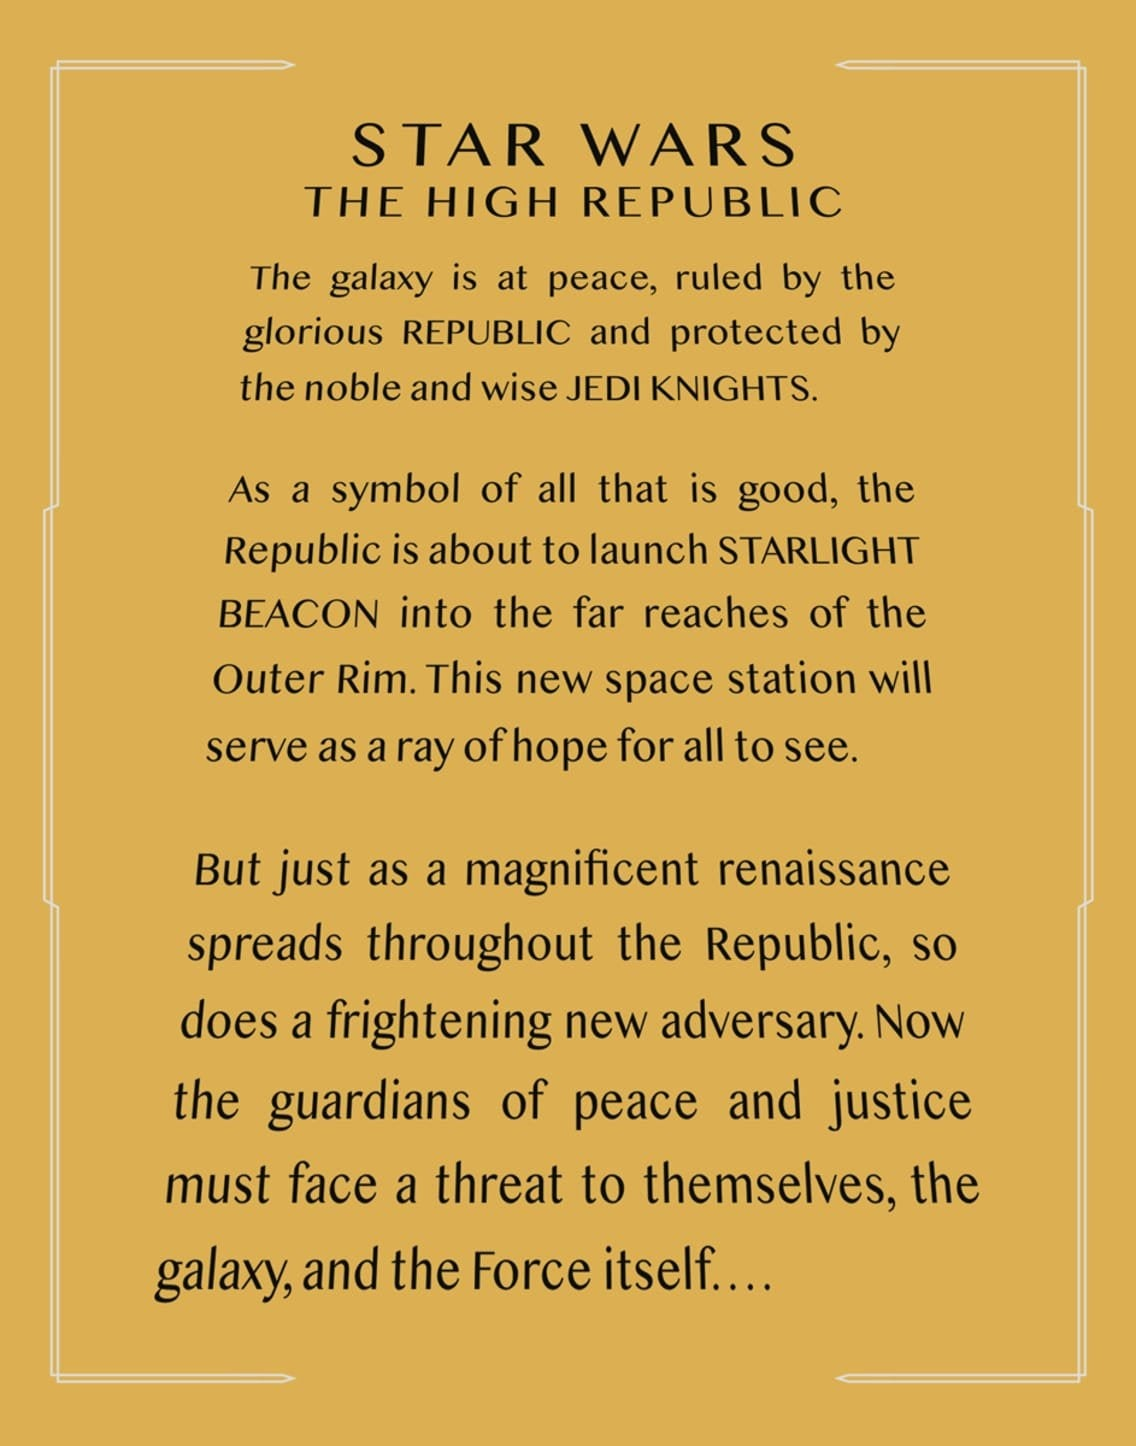 The High Republic crawl